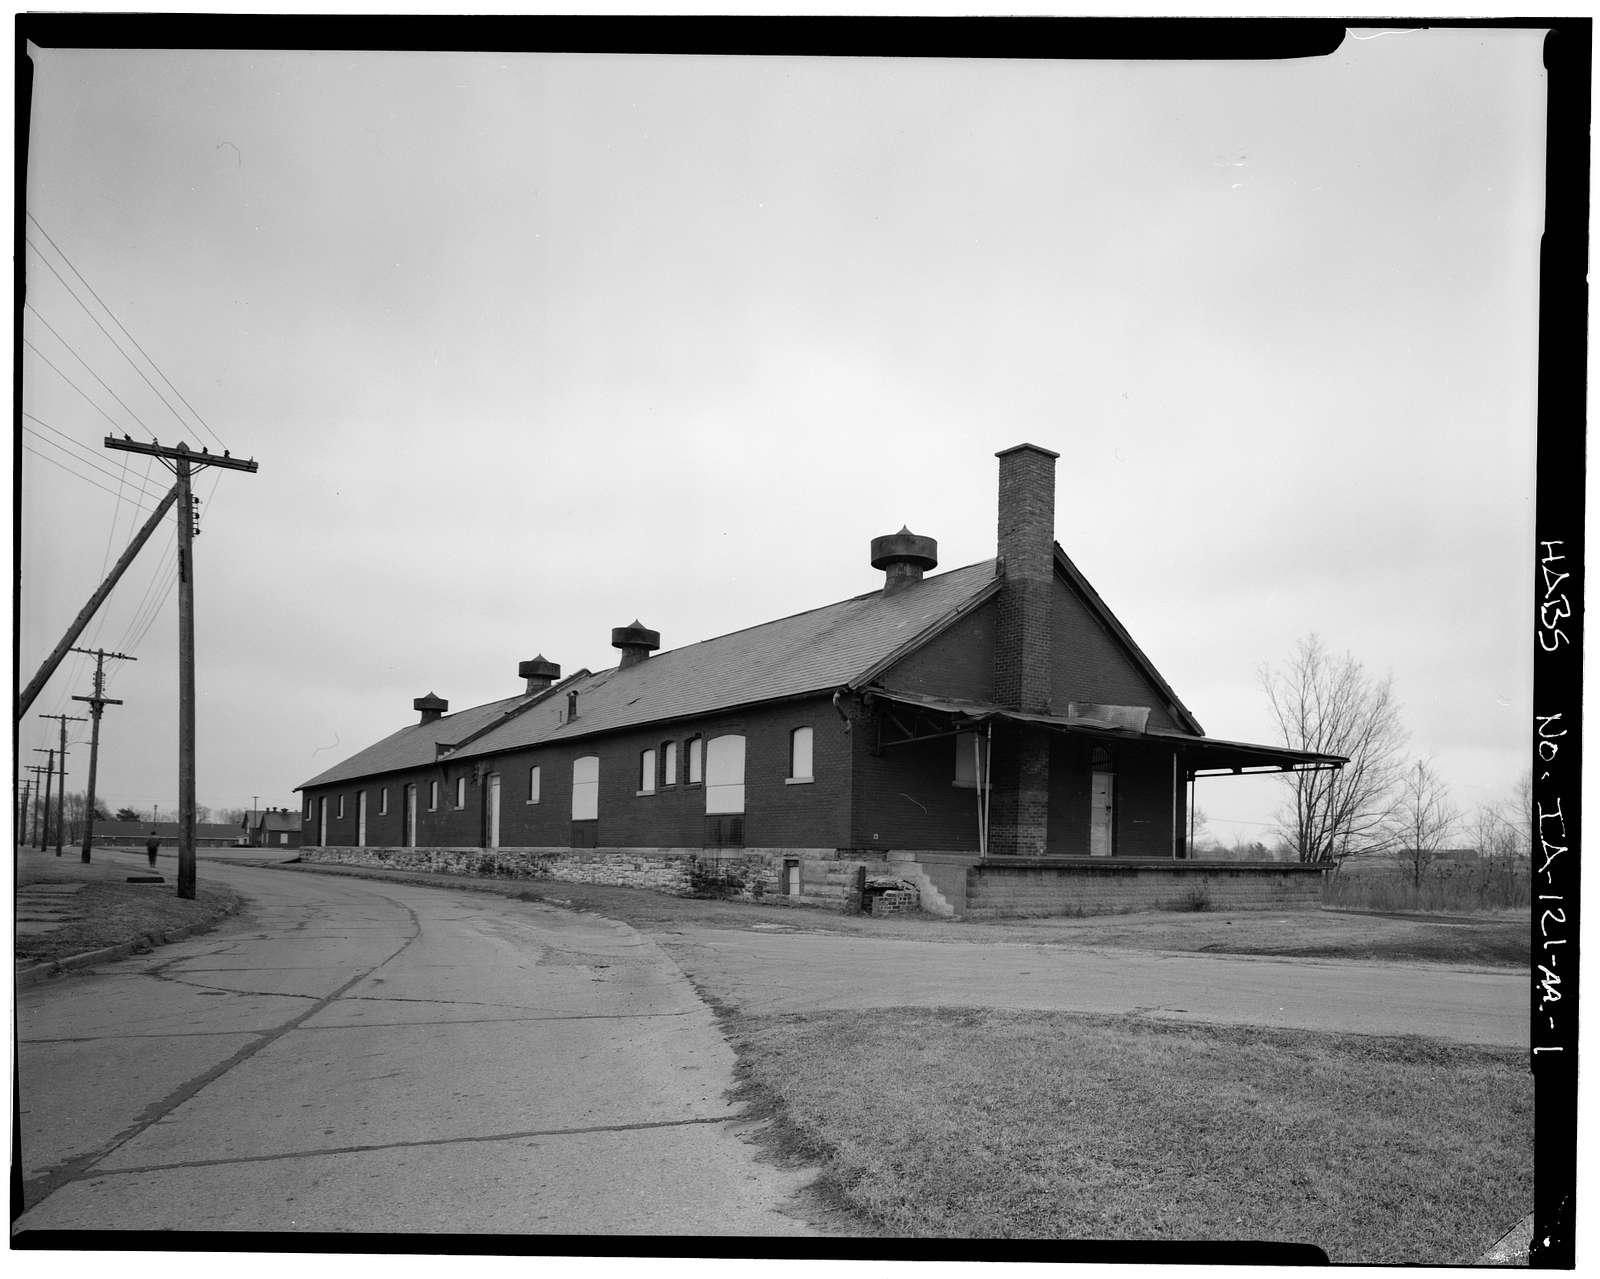 Fort Des Moines Historic Complex, Building No. 135, Des Moines, Polk County, IA